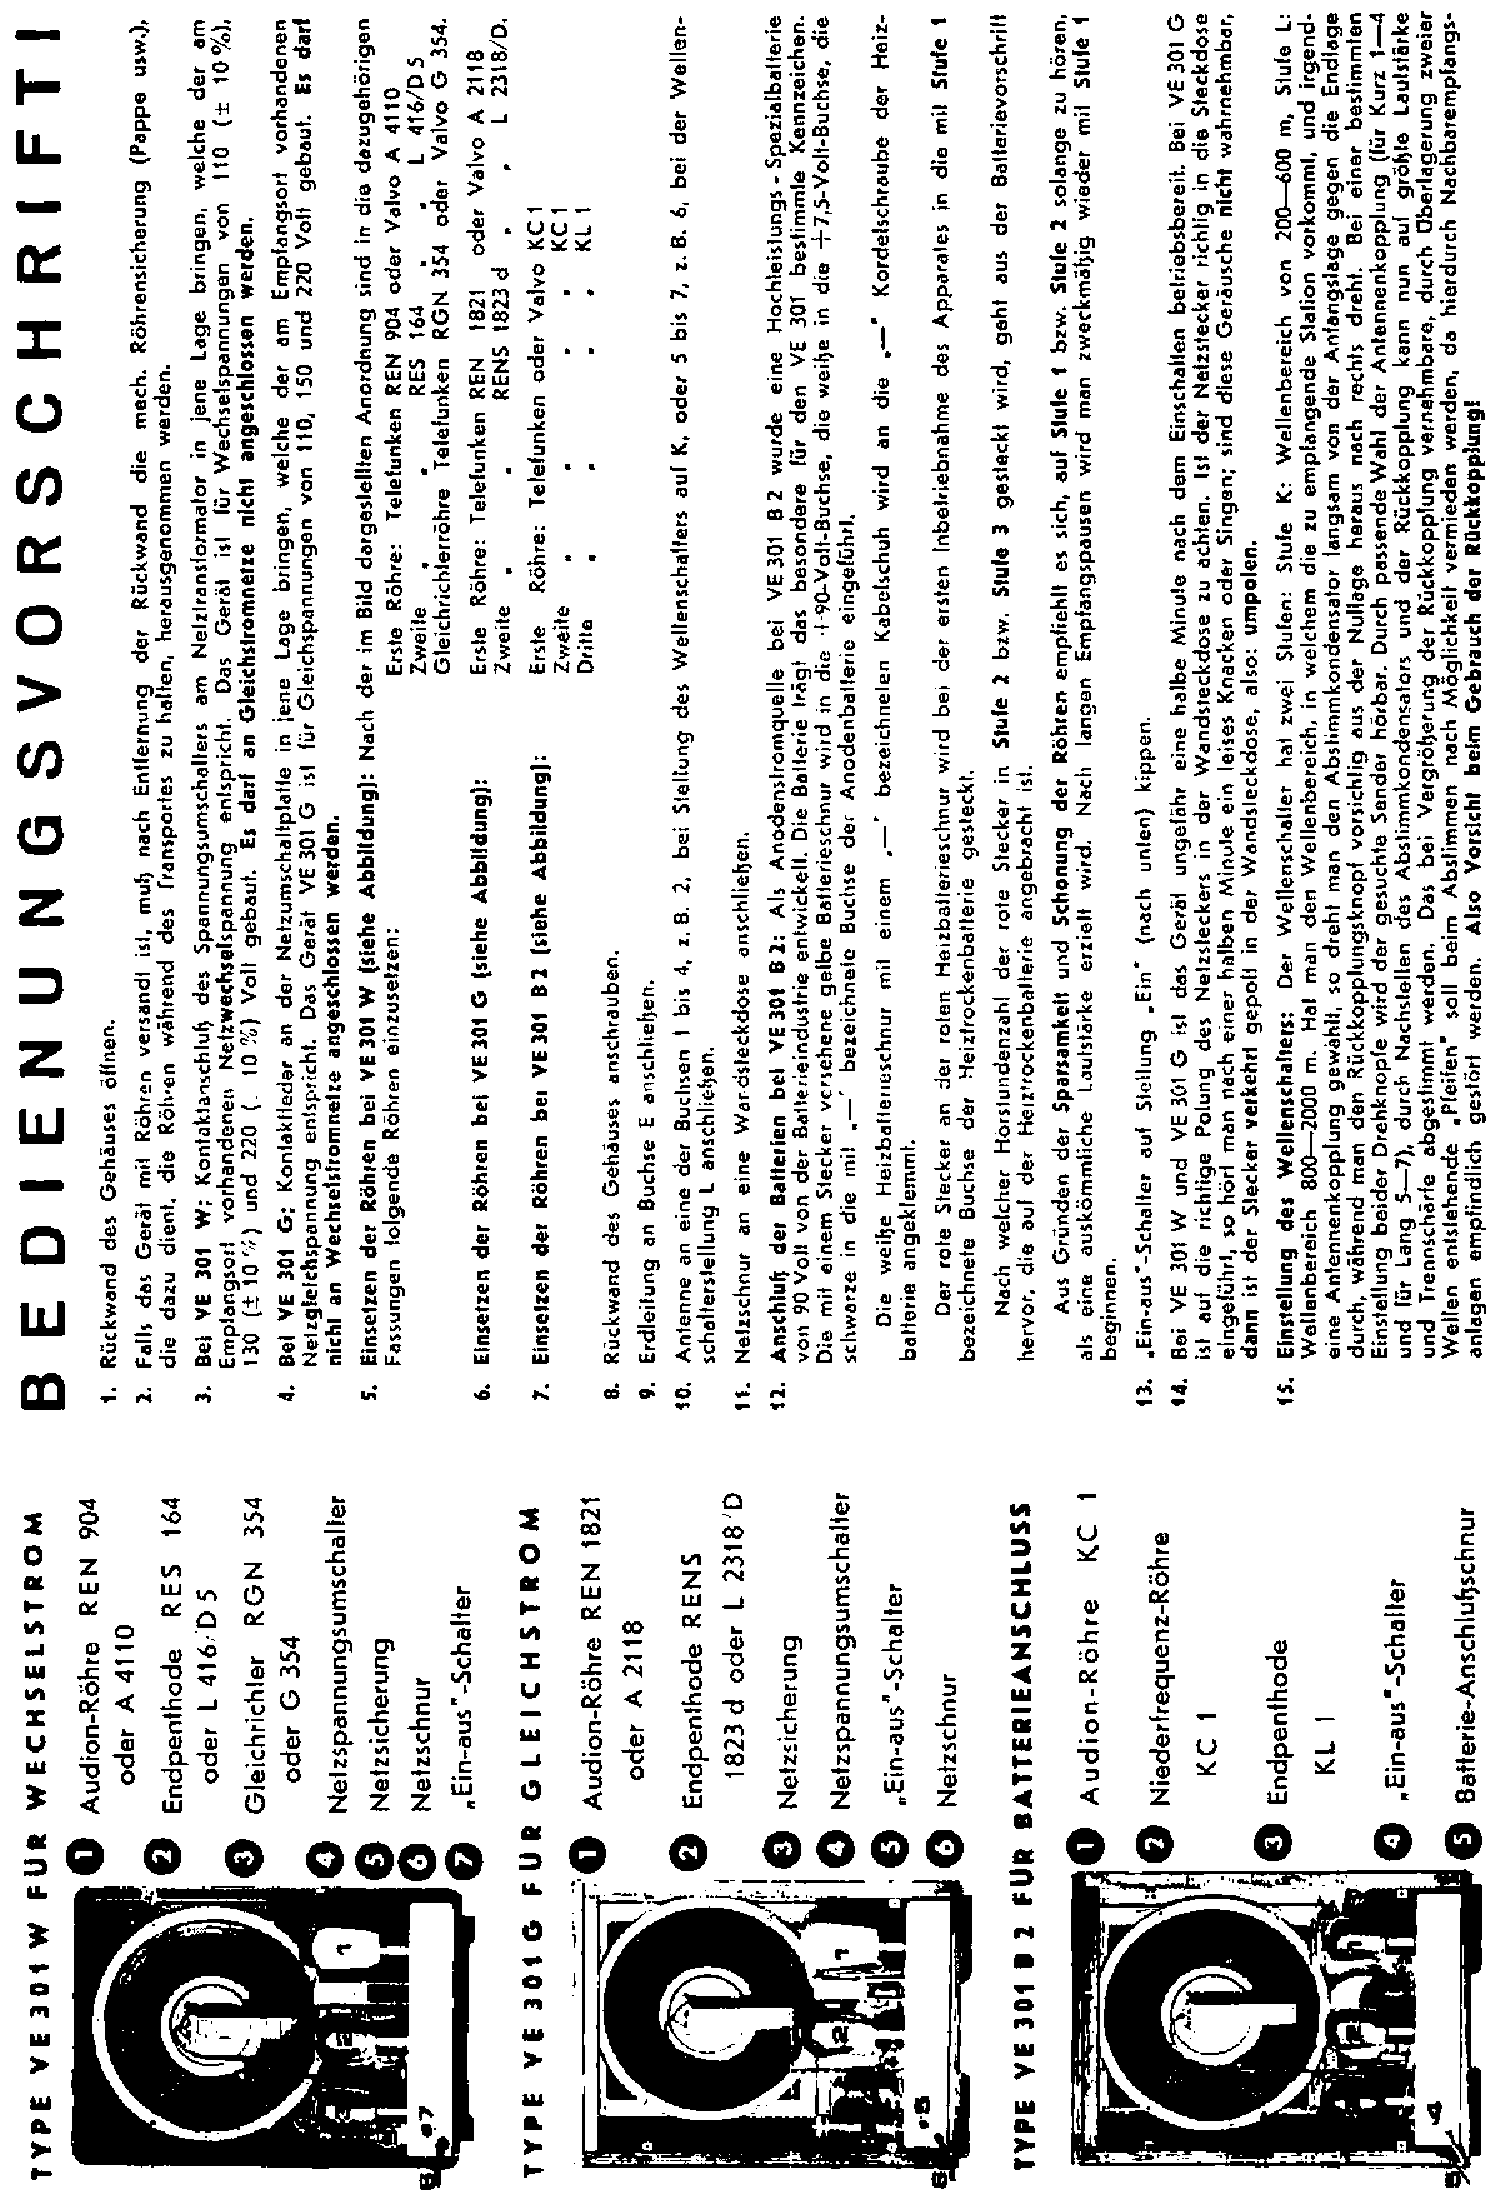 416 d service manual